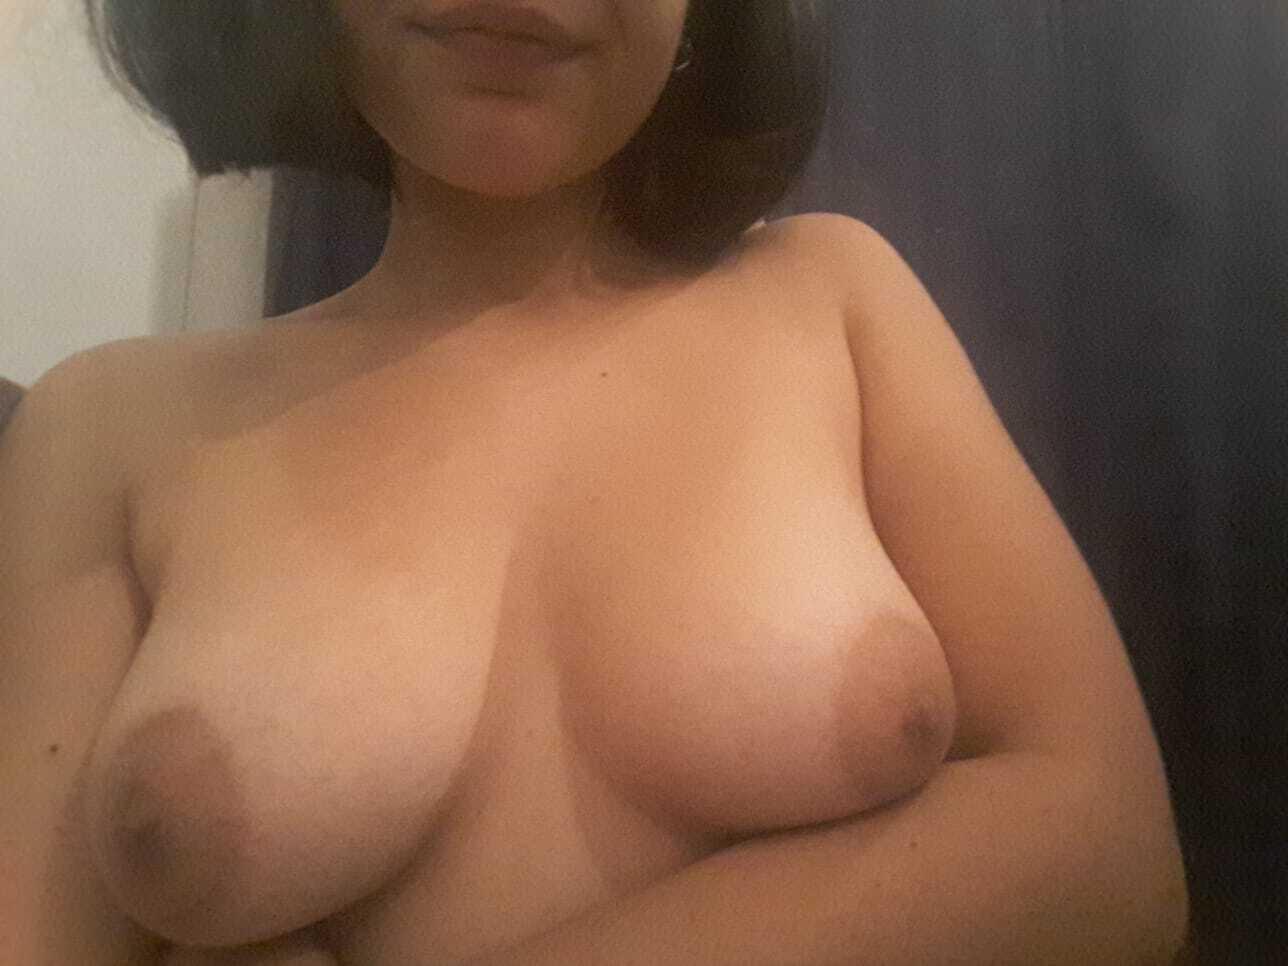 fotos caseras xxx, mujeres maduras desnudas